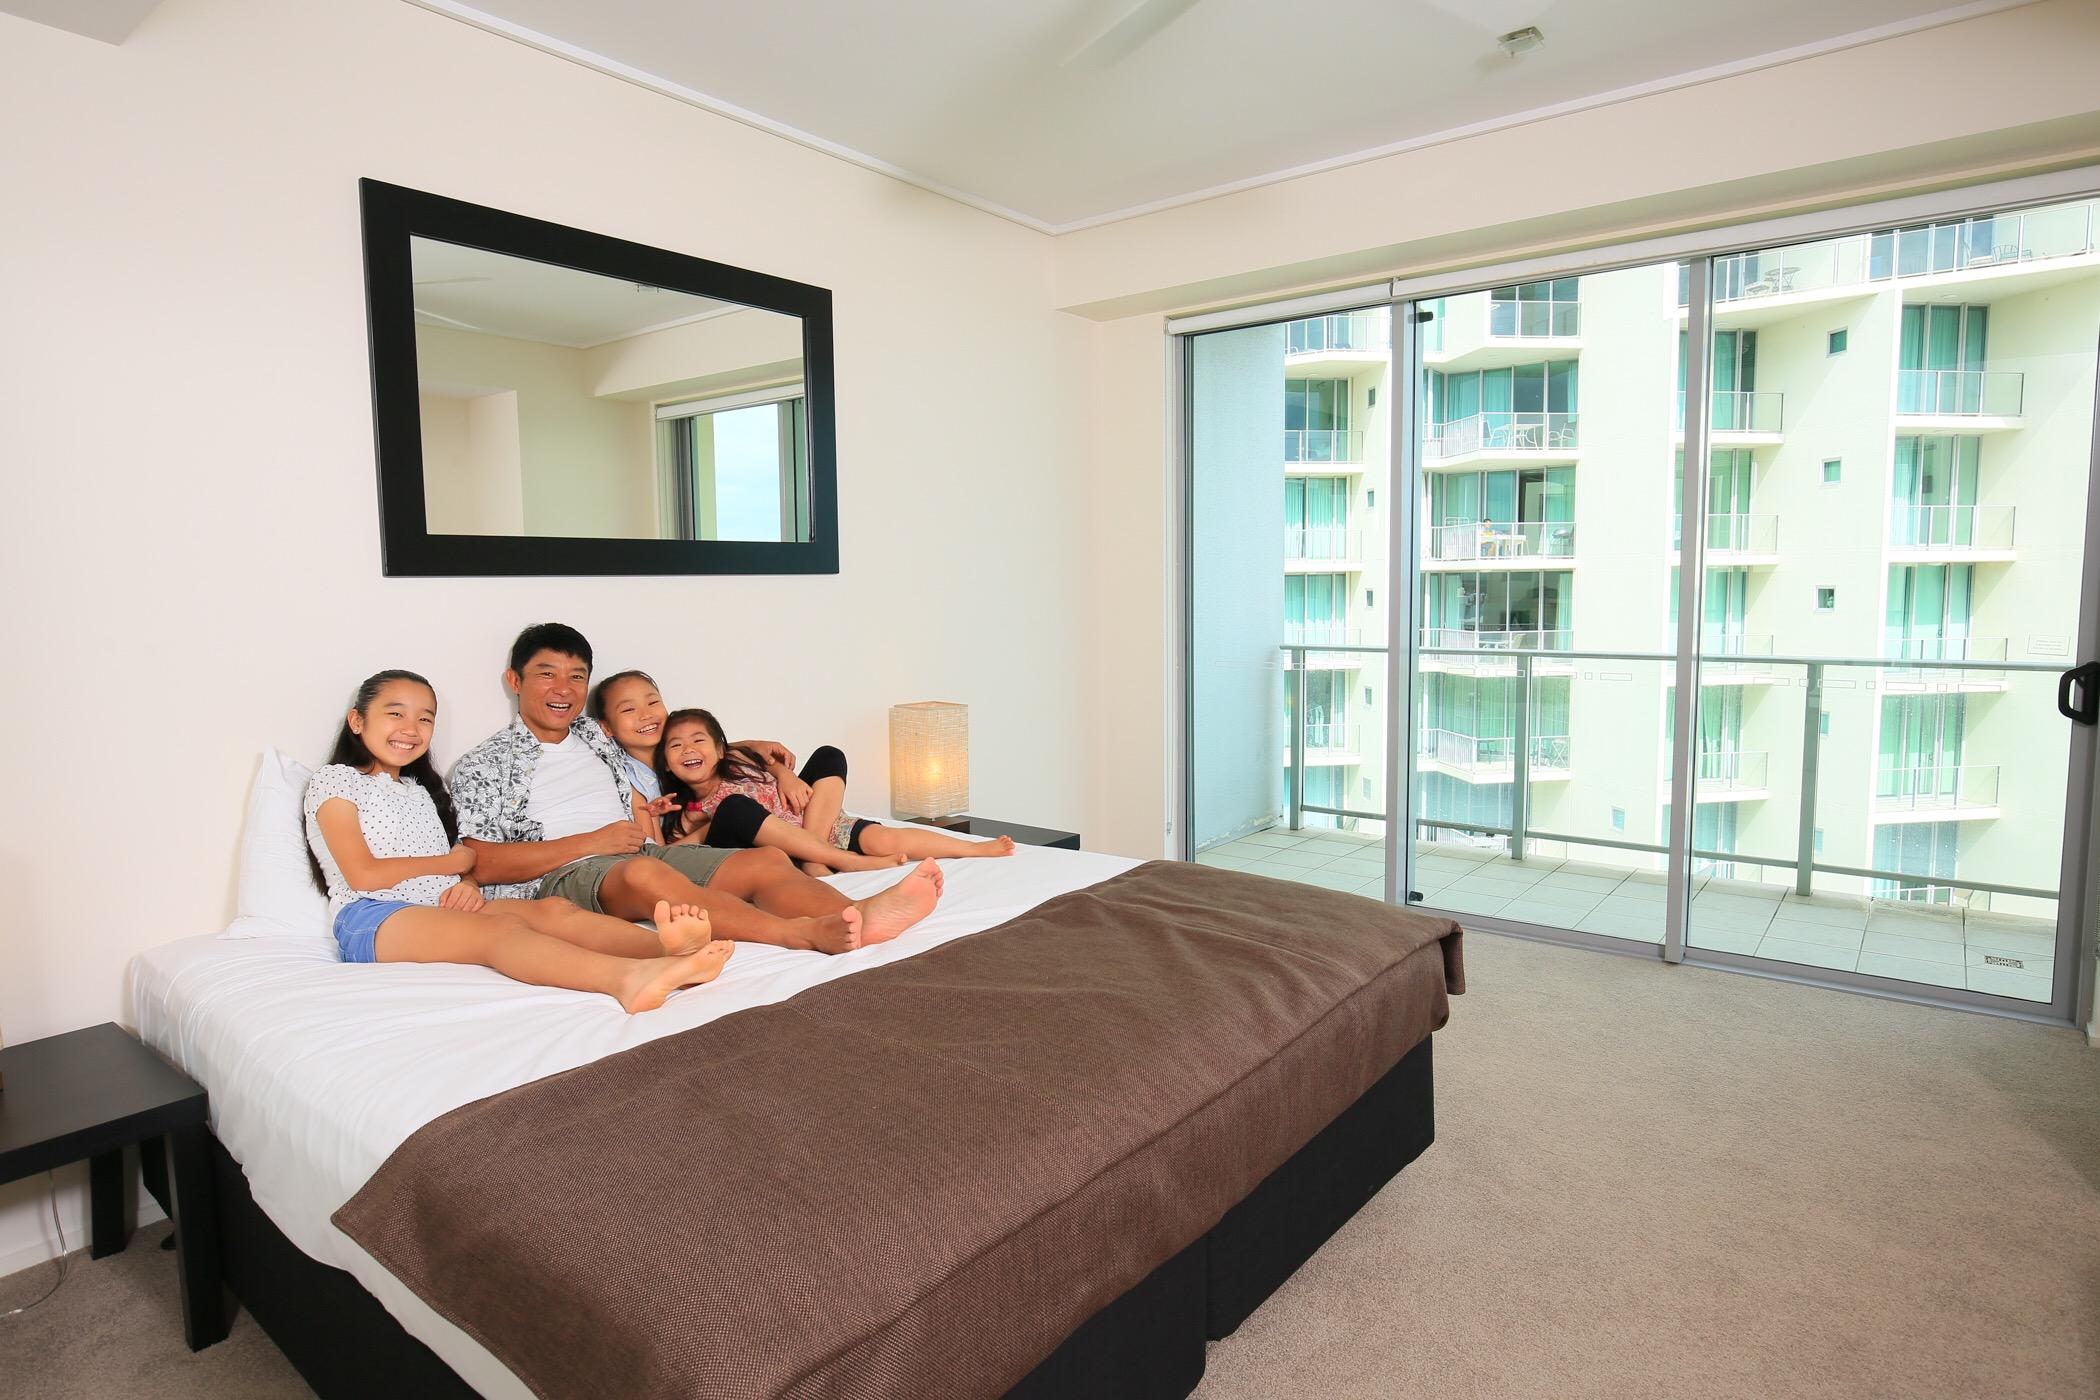 <p>メインベッドルームにある大型のベッドは大人数でも眠れるゆったり広々サイズ。フカフカのベッドは快適な寝心地が得られること間違いなし。</p>